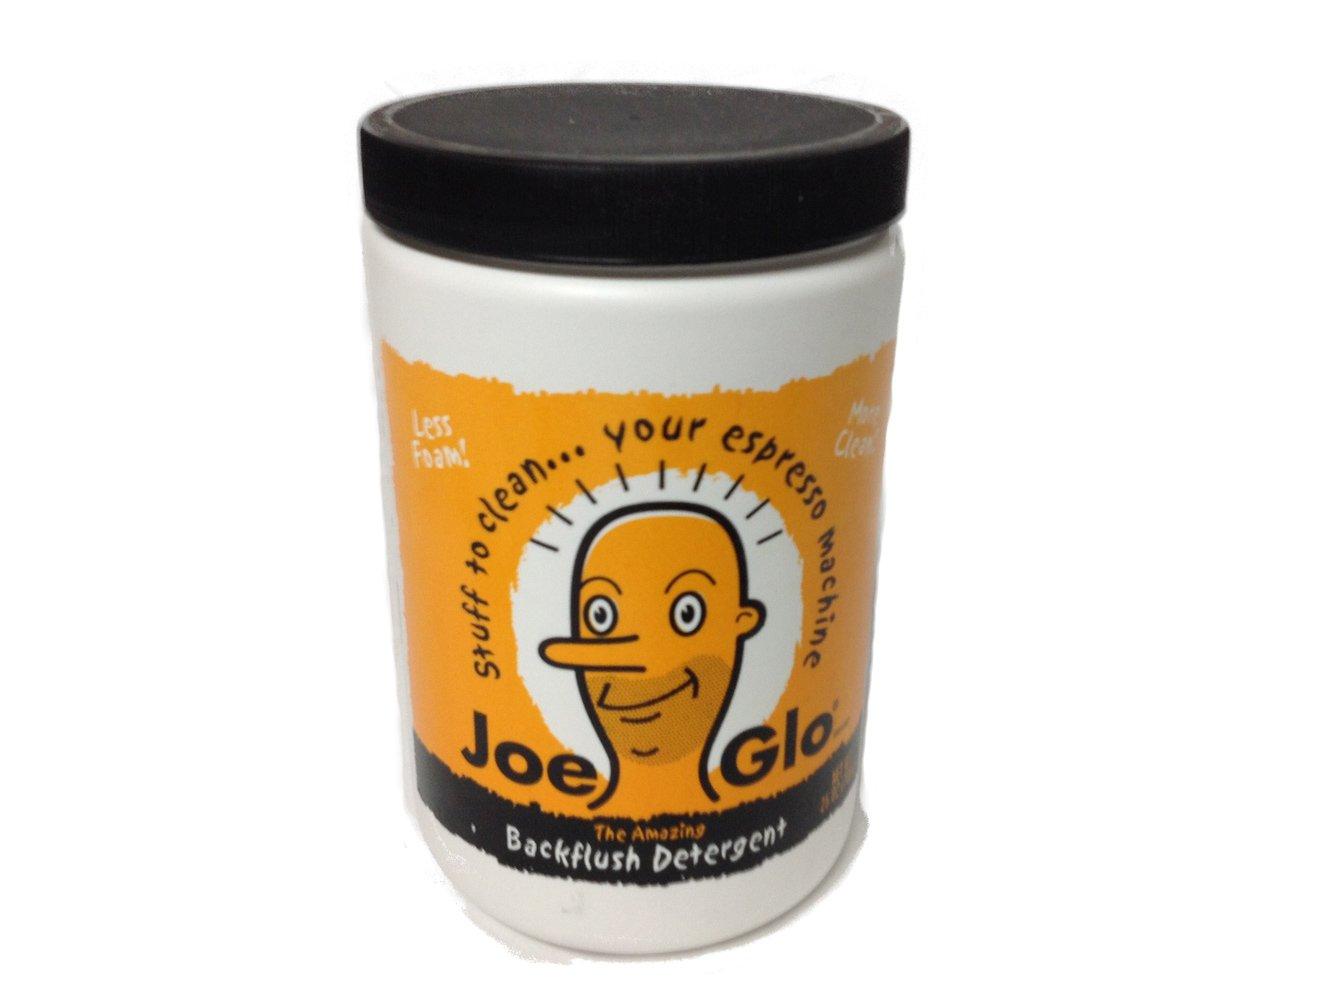 Joe Glo Espresso Machine-Coffee Pot Cleaner (25 Ounce) by Joe Glo